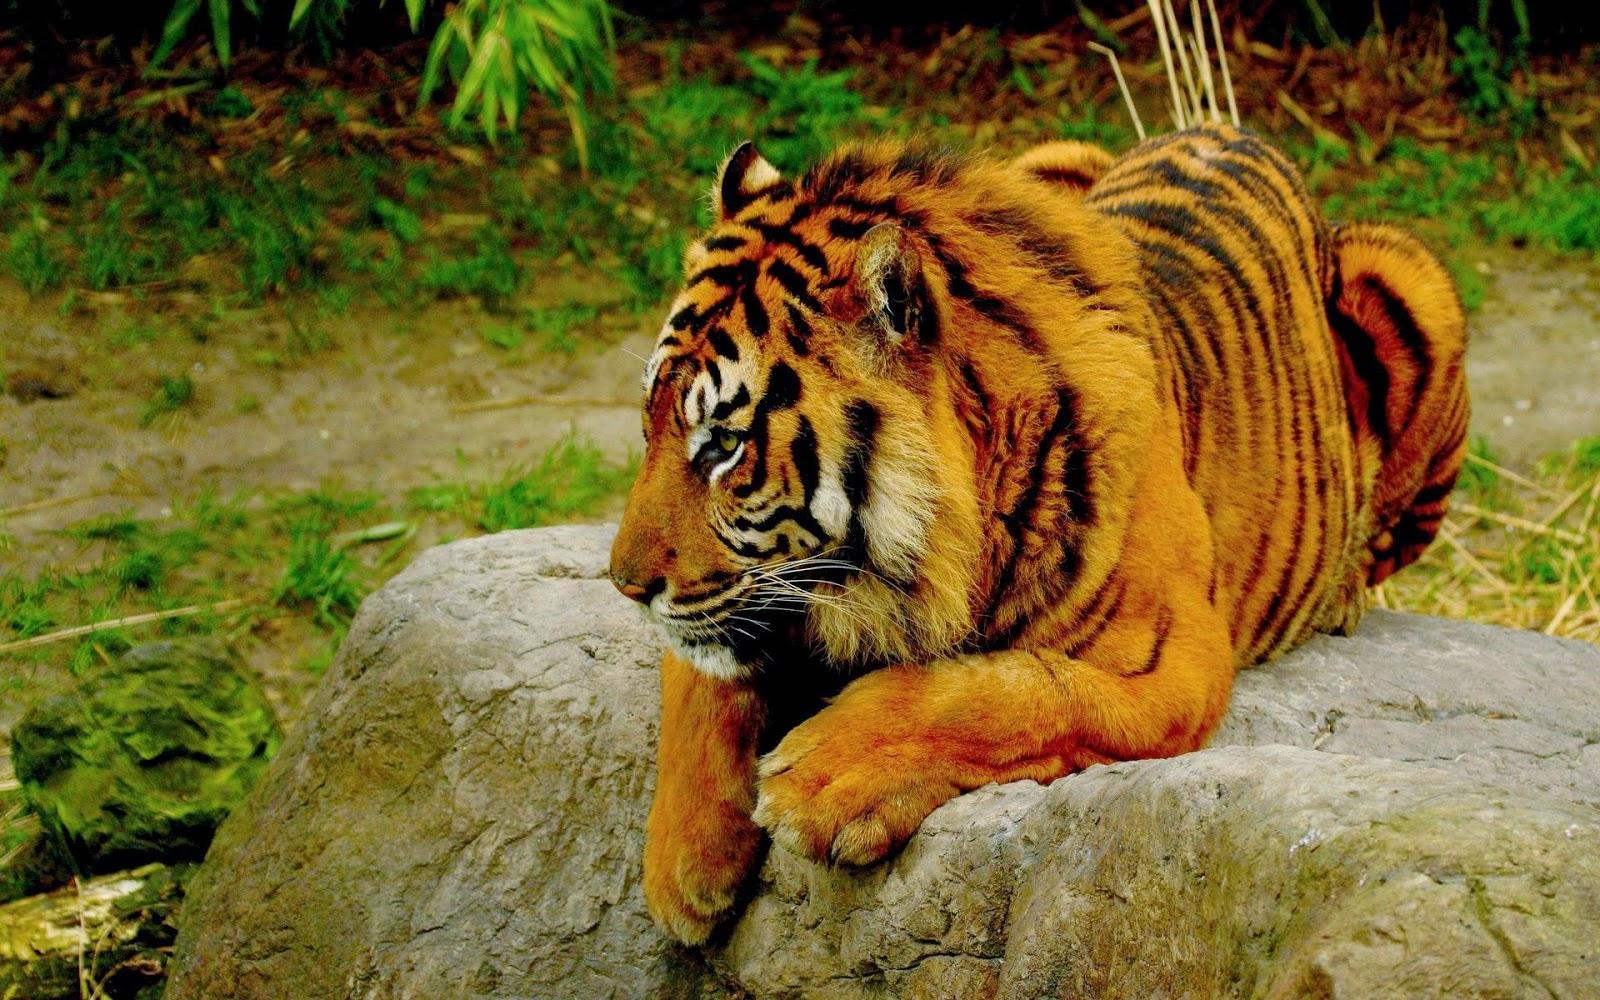 Desktop HD Wallpapers Free Downloads: Bengal Tiger HD Wallpapers